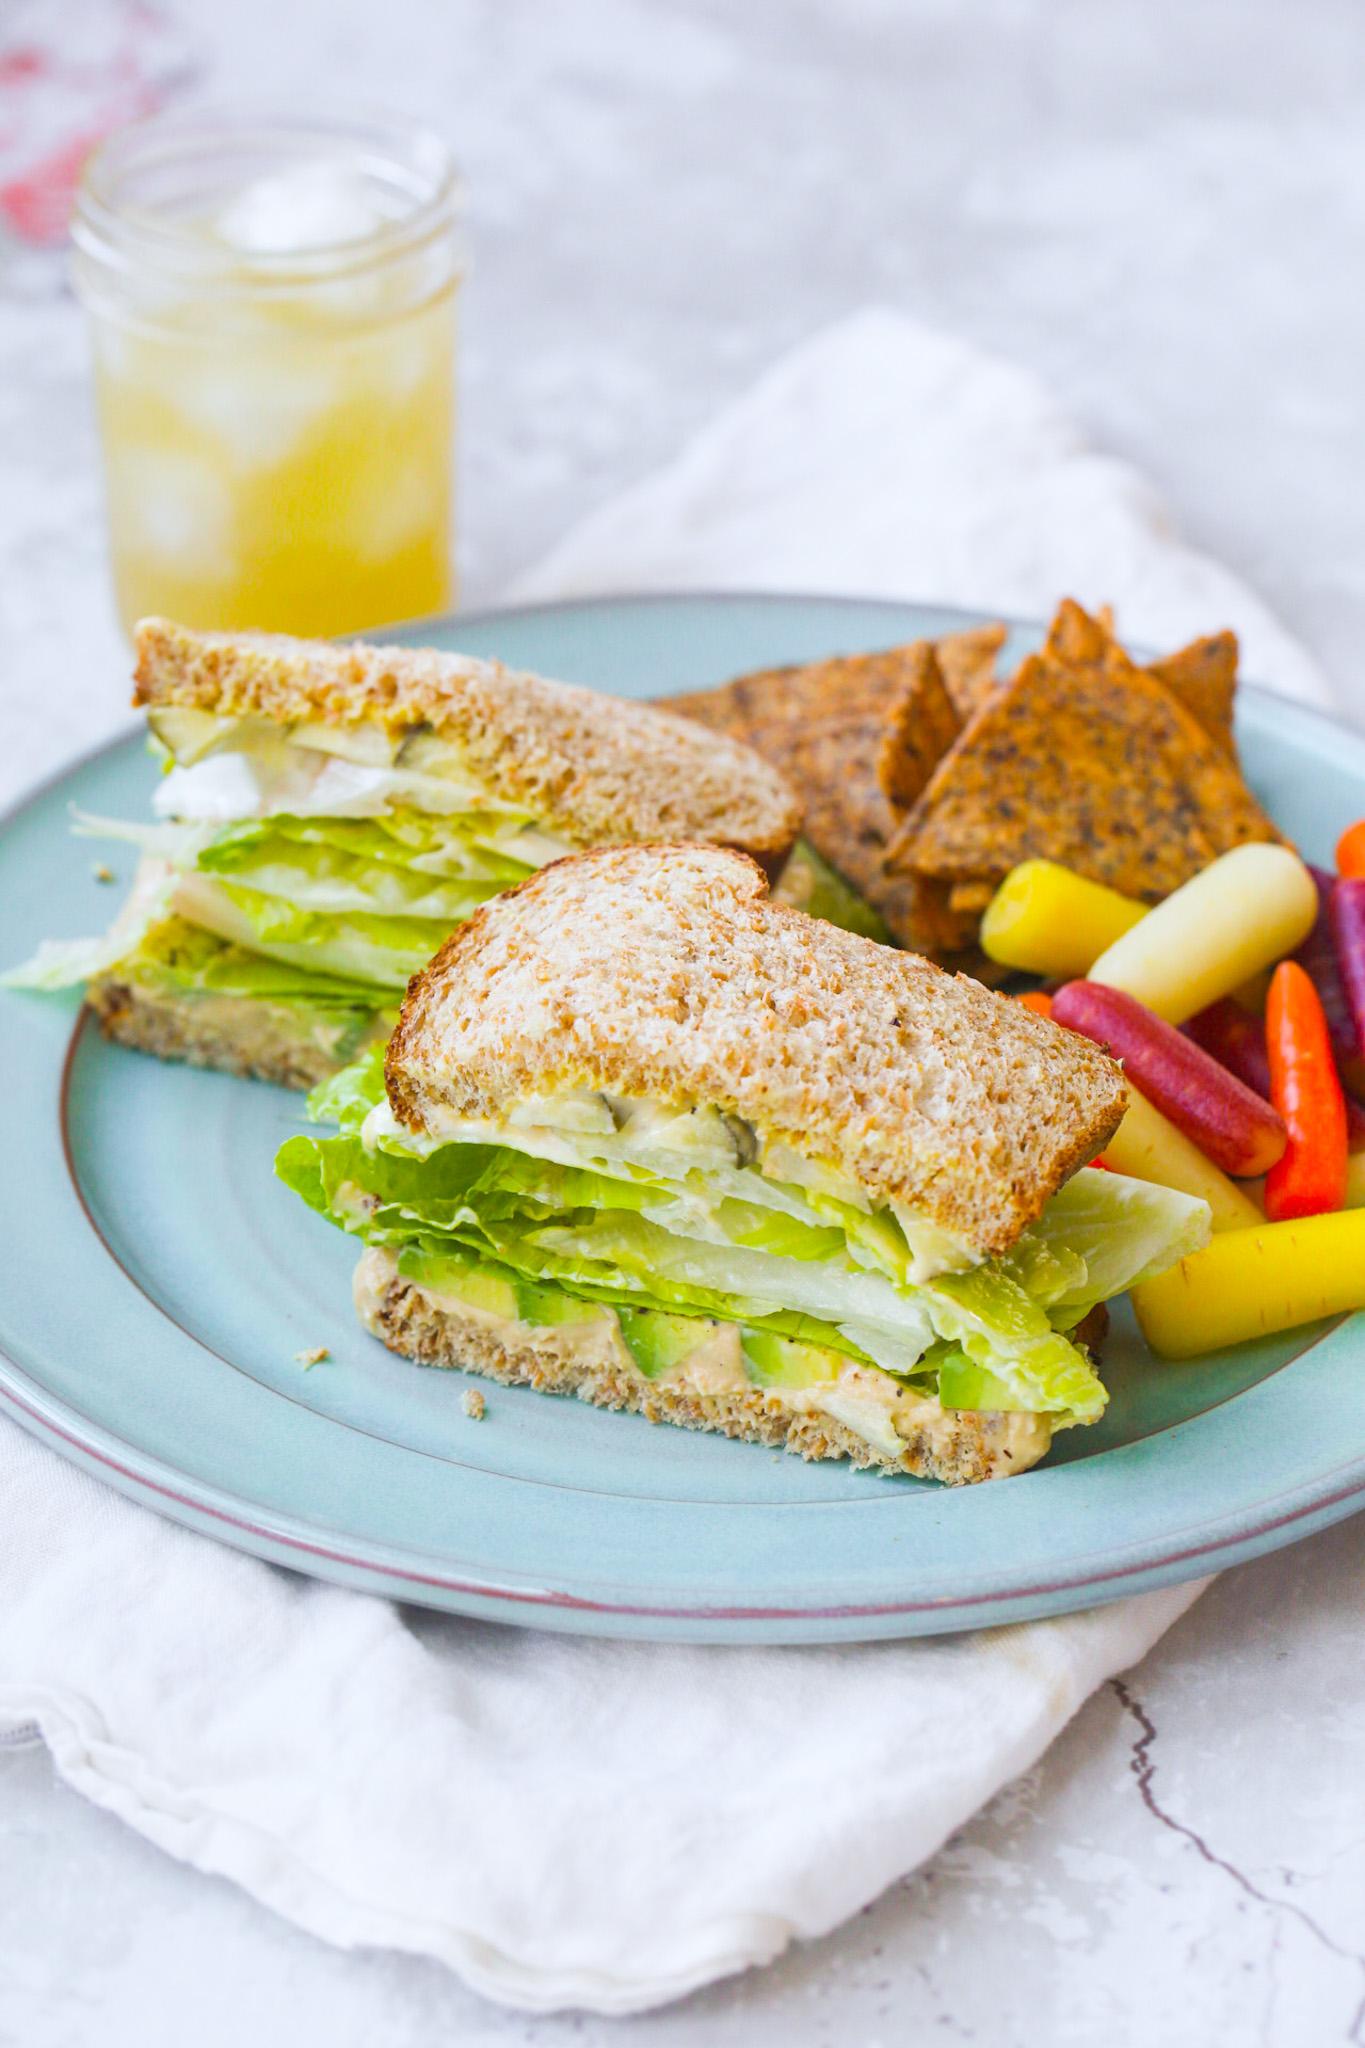 Green Crunch 'n 'Cado Sandwich lunch plate with drink